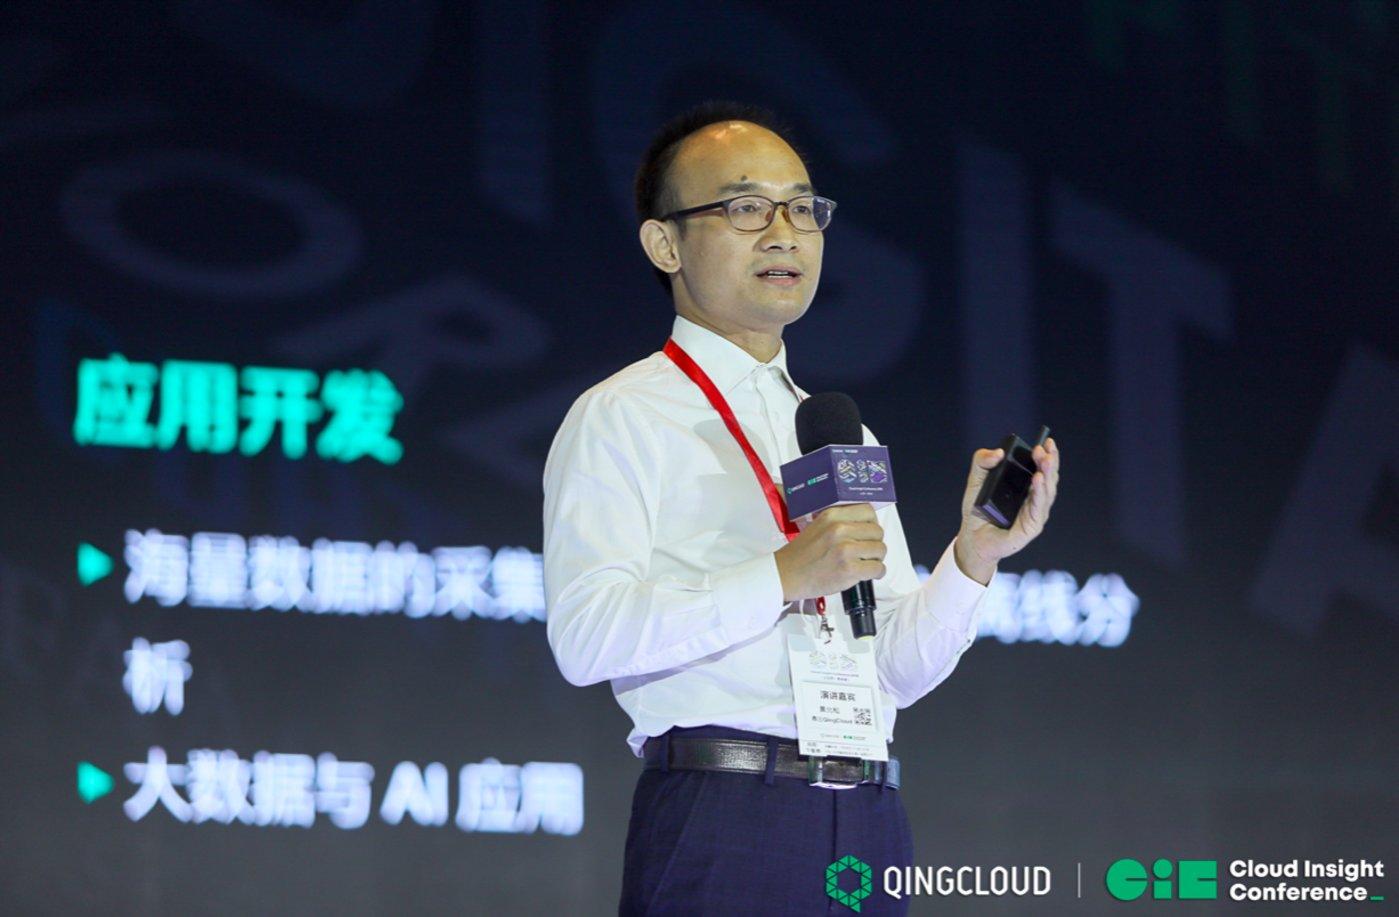 青云QingCloud CEO黄允松在CIC2019